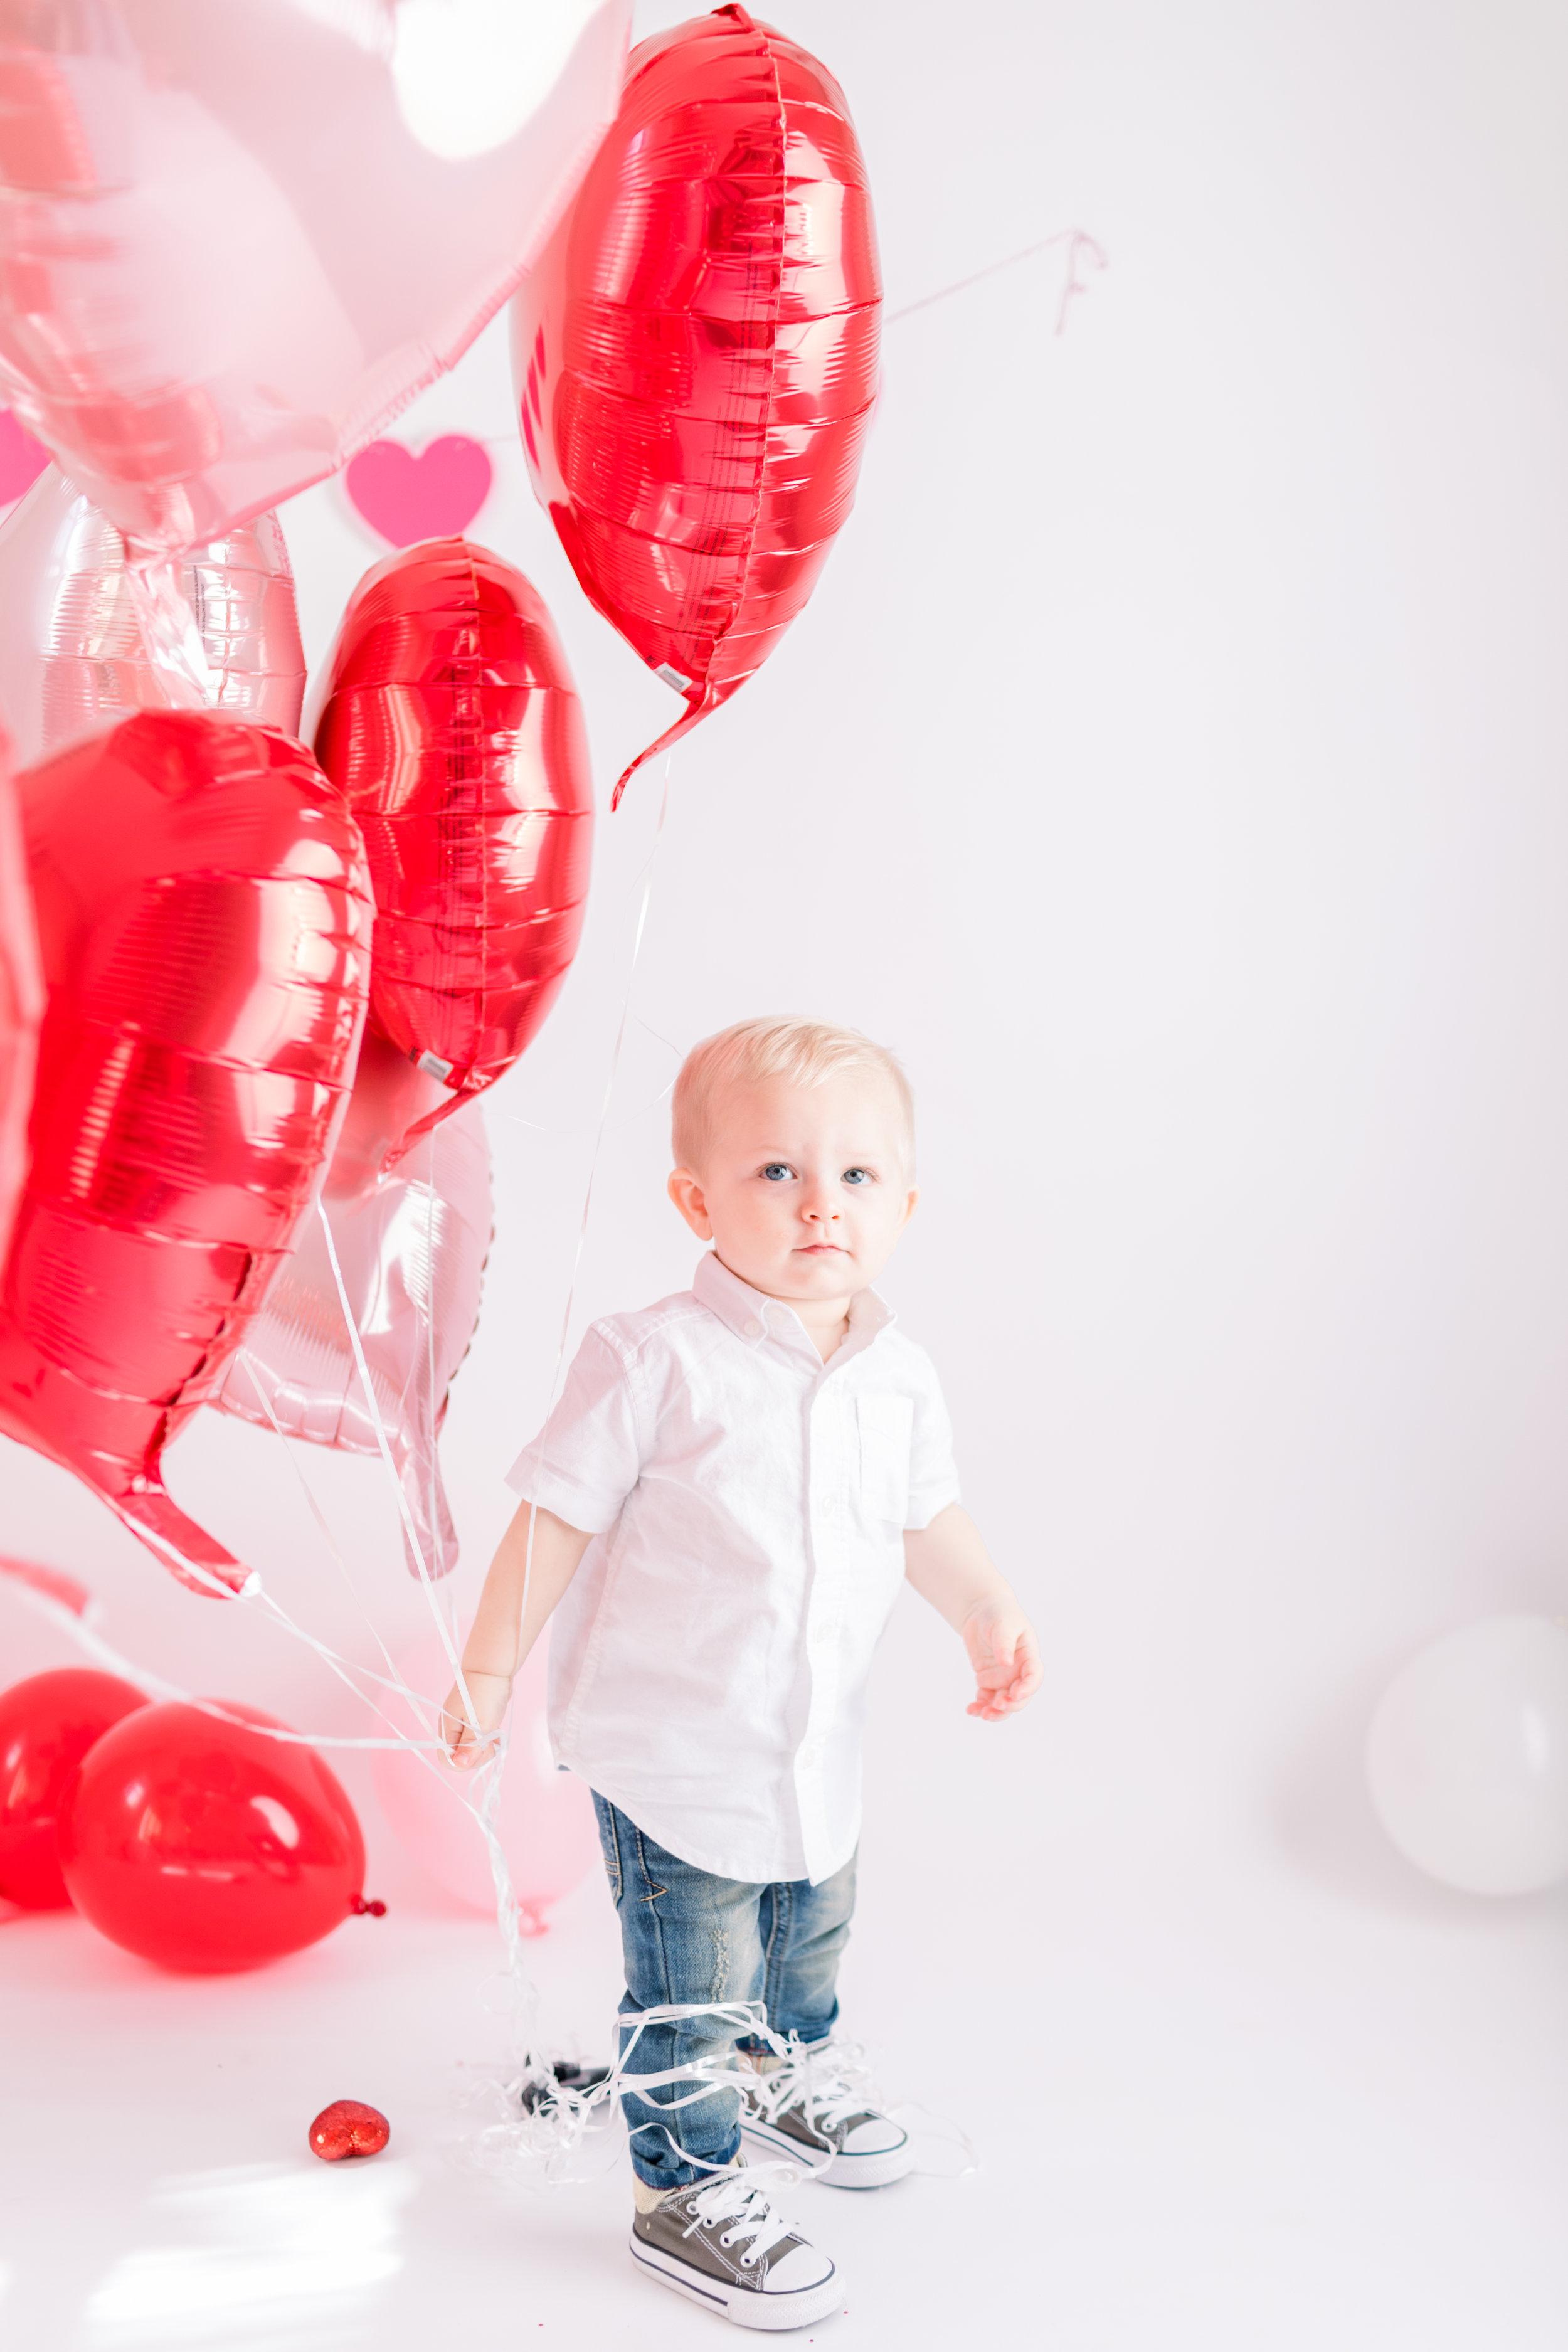 valentines-day-photo-shoot-inspiration